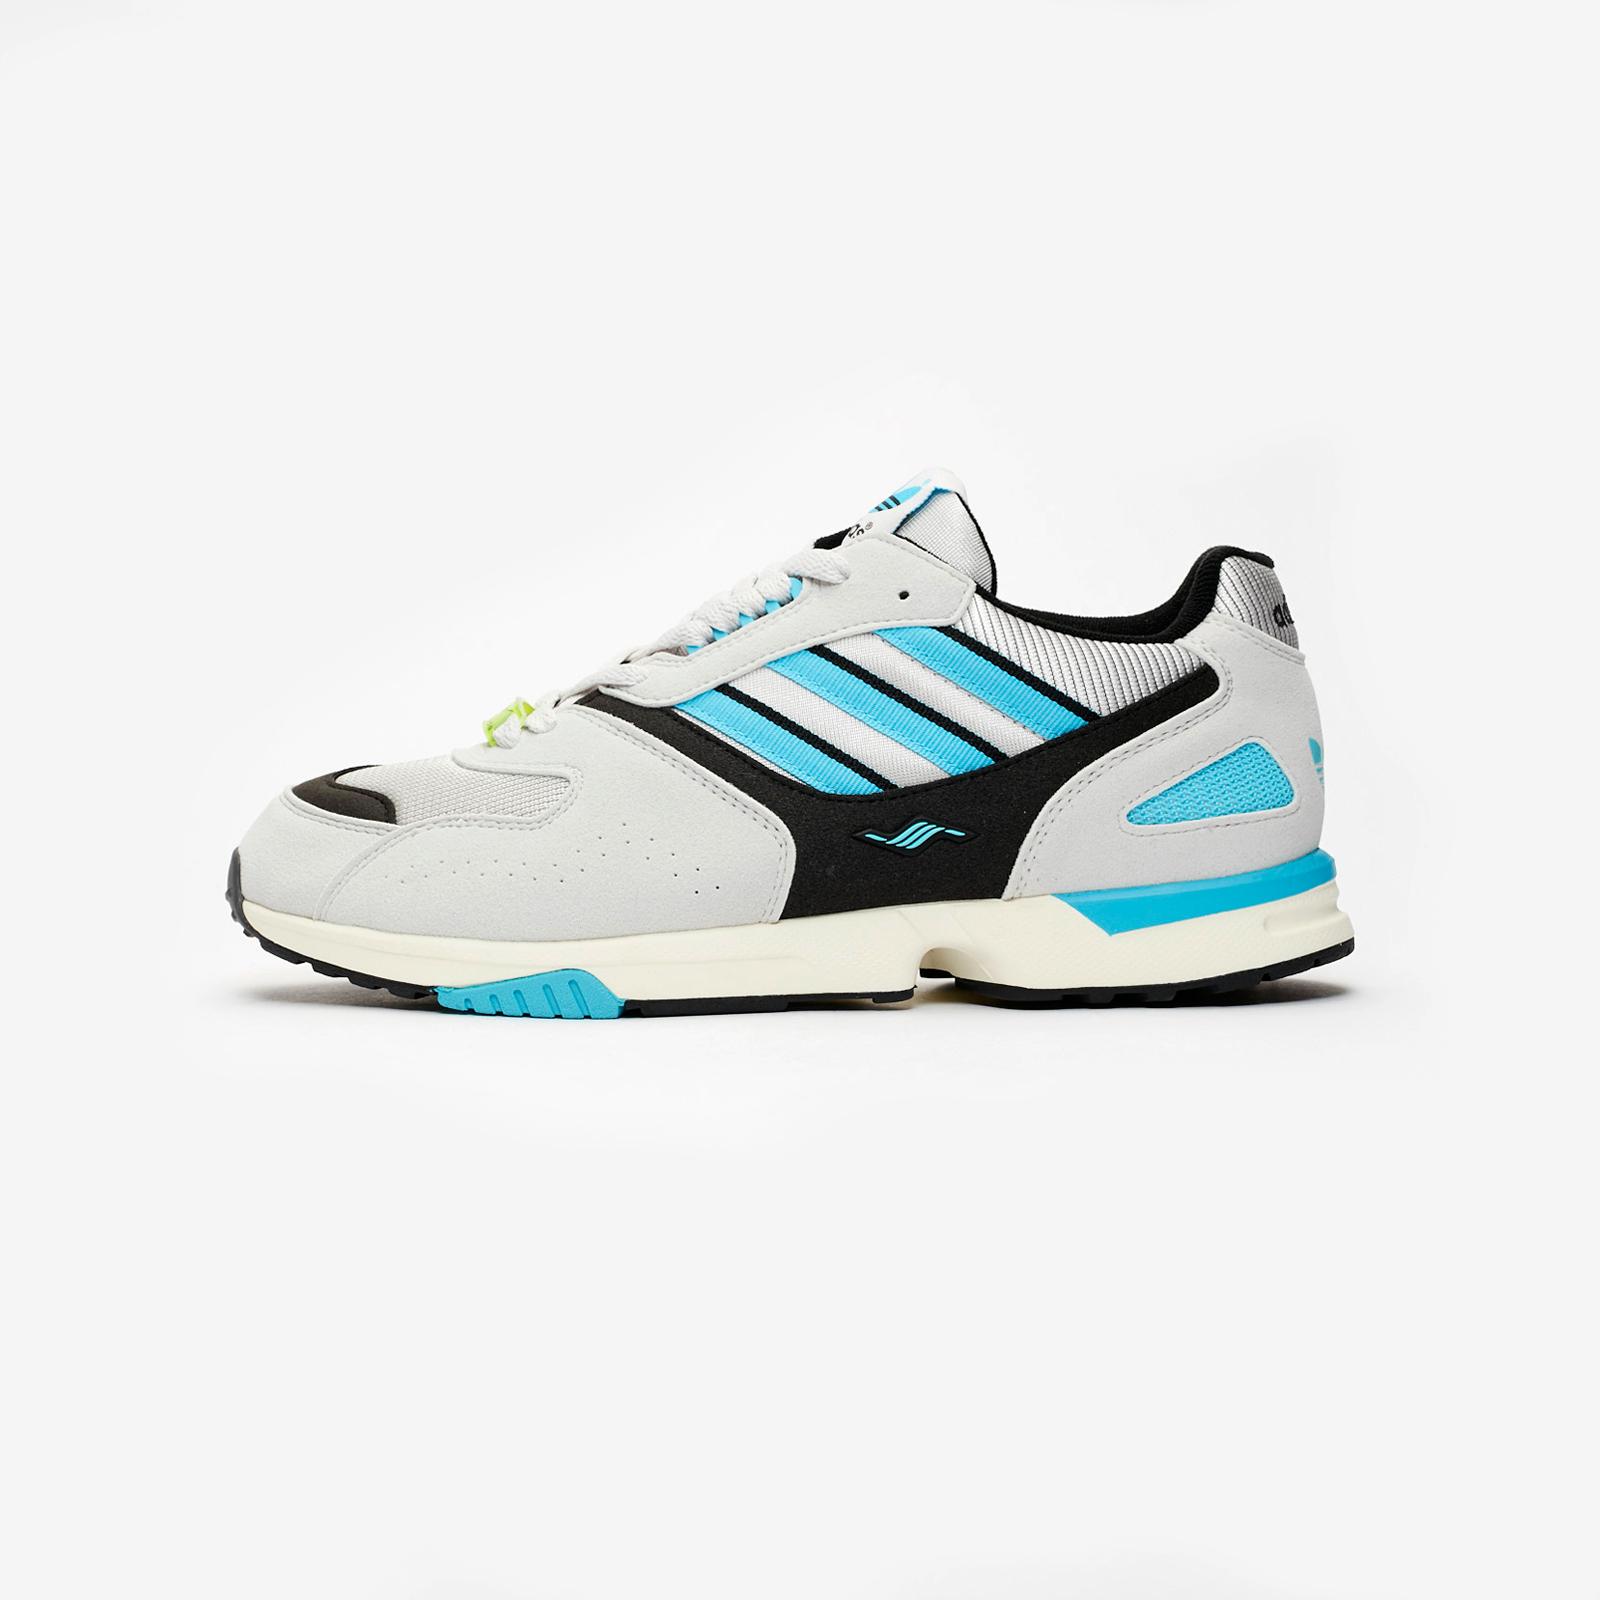 adidas ZX 4000 x Consortium - D97734 - Sneakersnstuff I ...